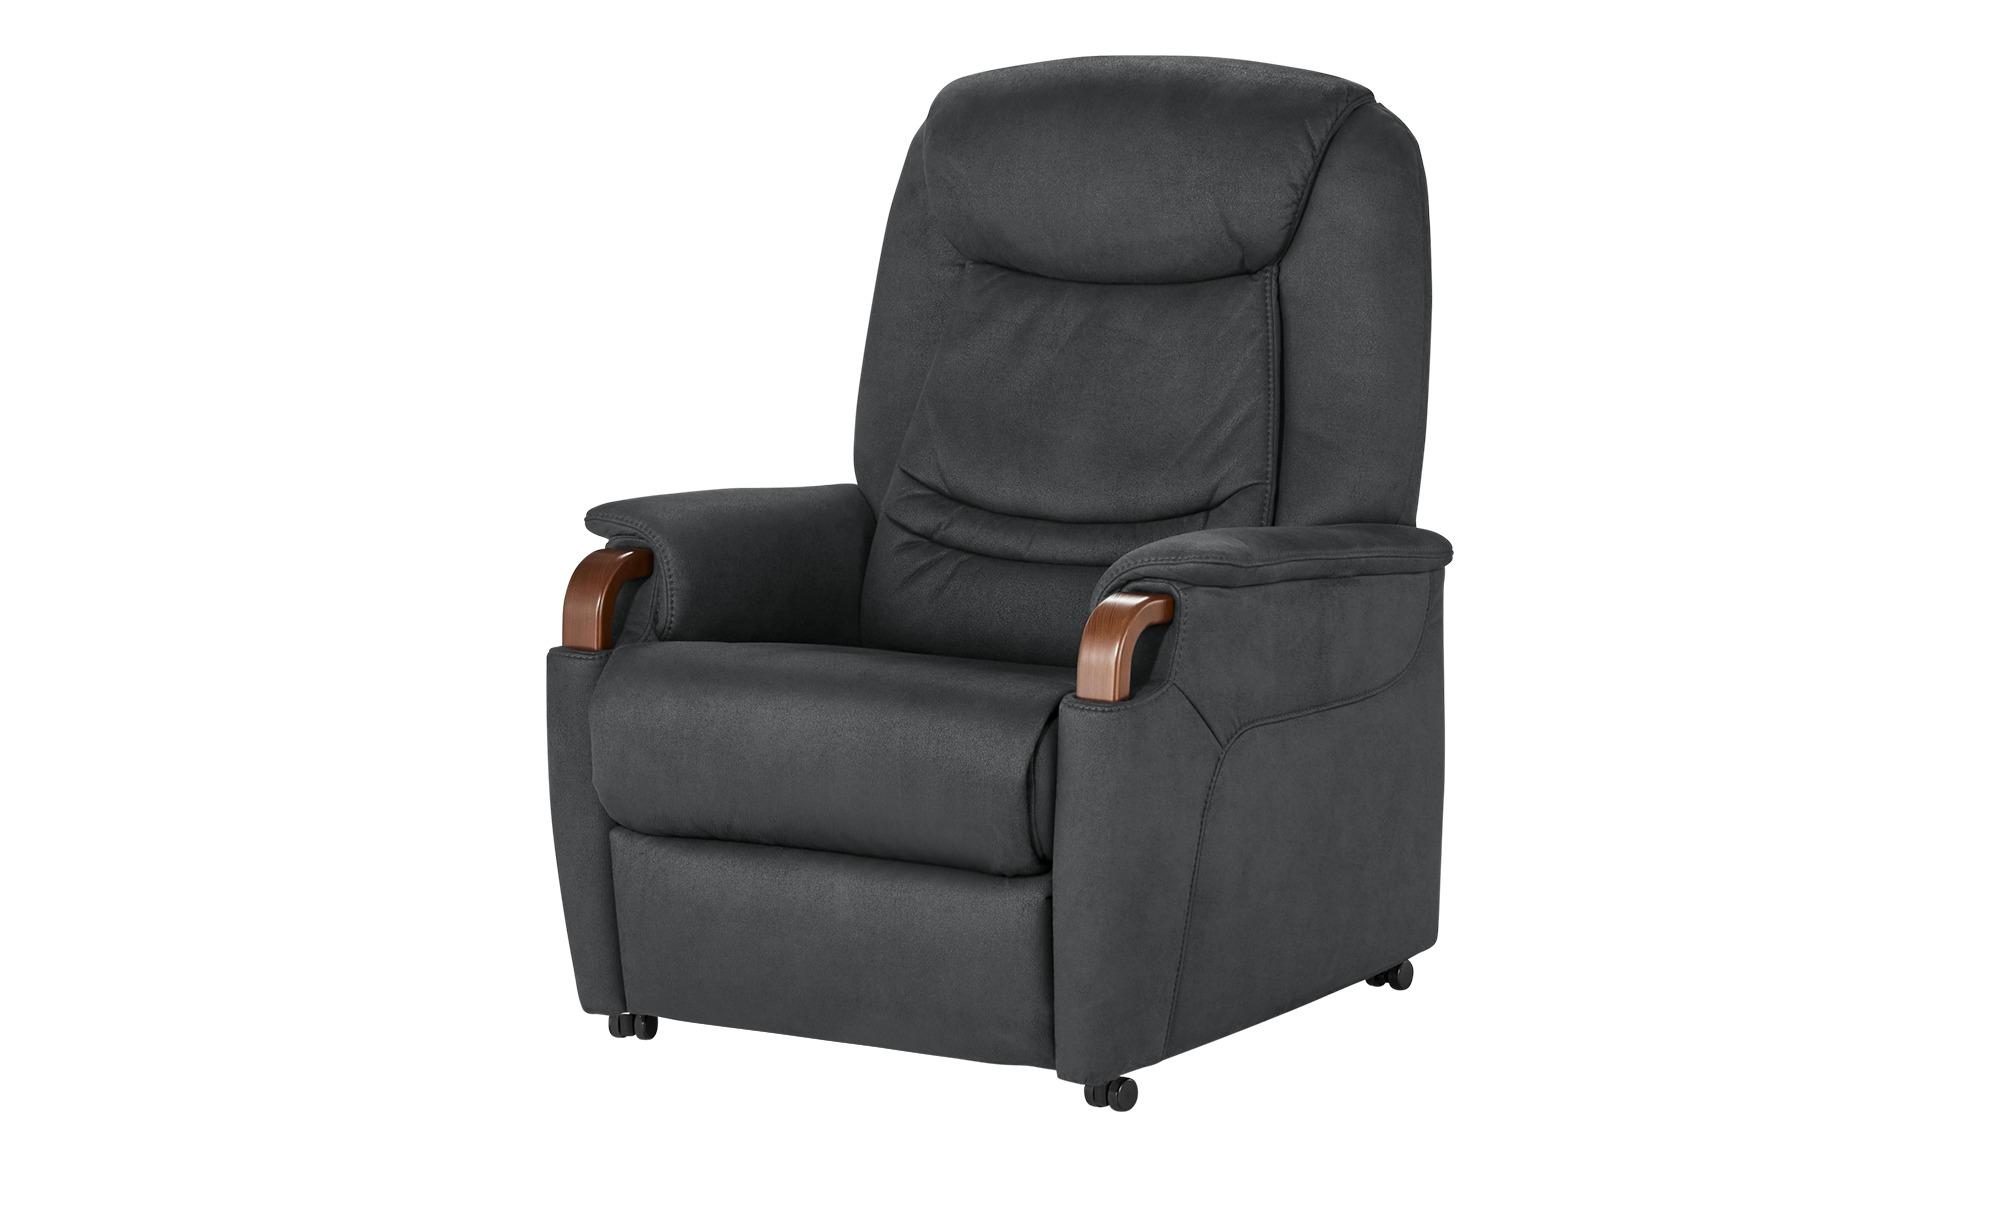 Hukla Relaxsessel  Jonas ¦ grau ¦ Maße (cm): B: 83 H: 106 T: 82 Polstermöbel > Sessel > Fernsehsessel - Höffner